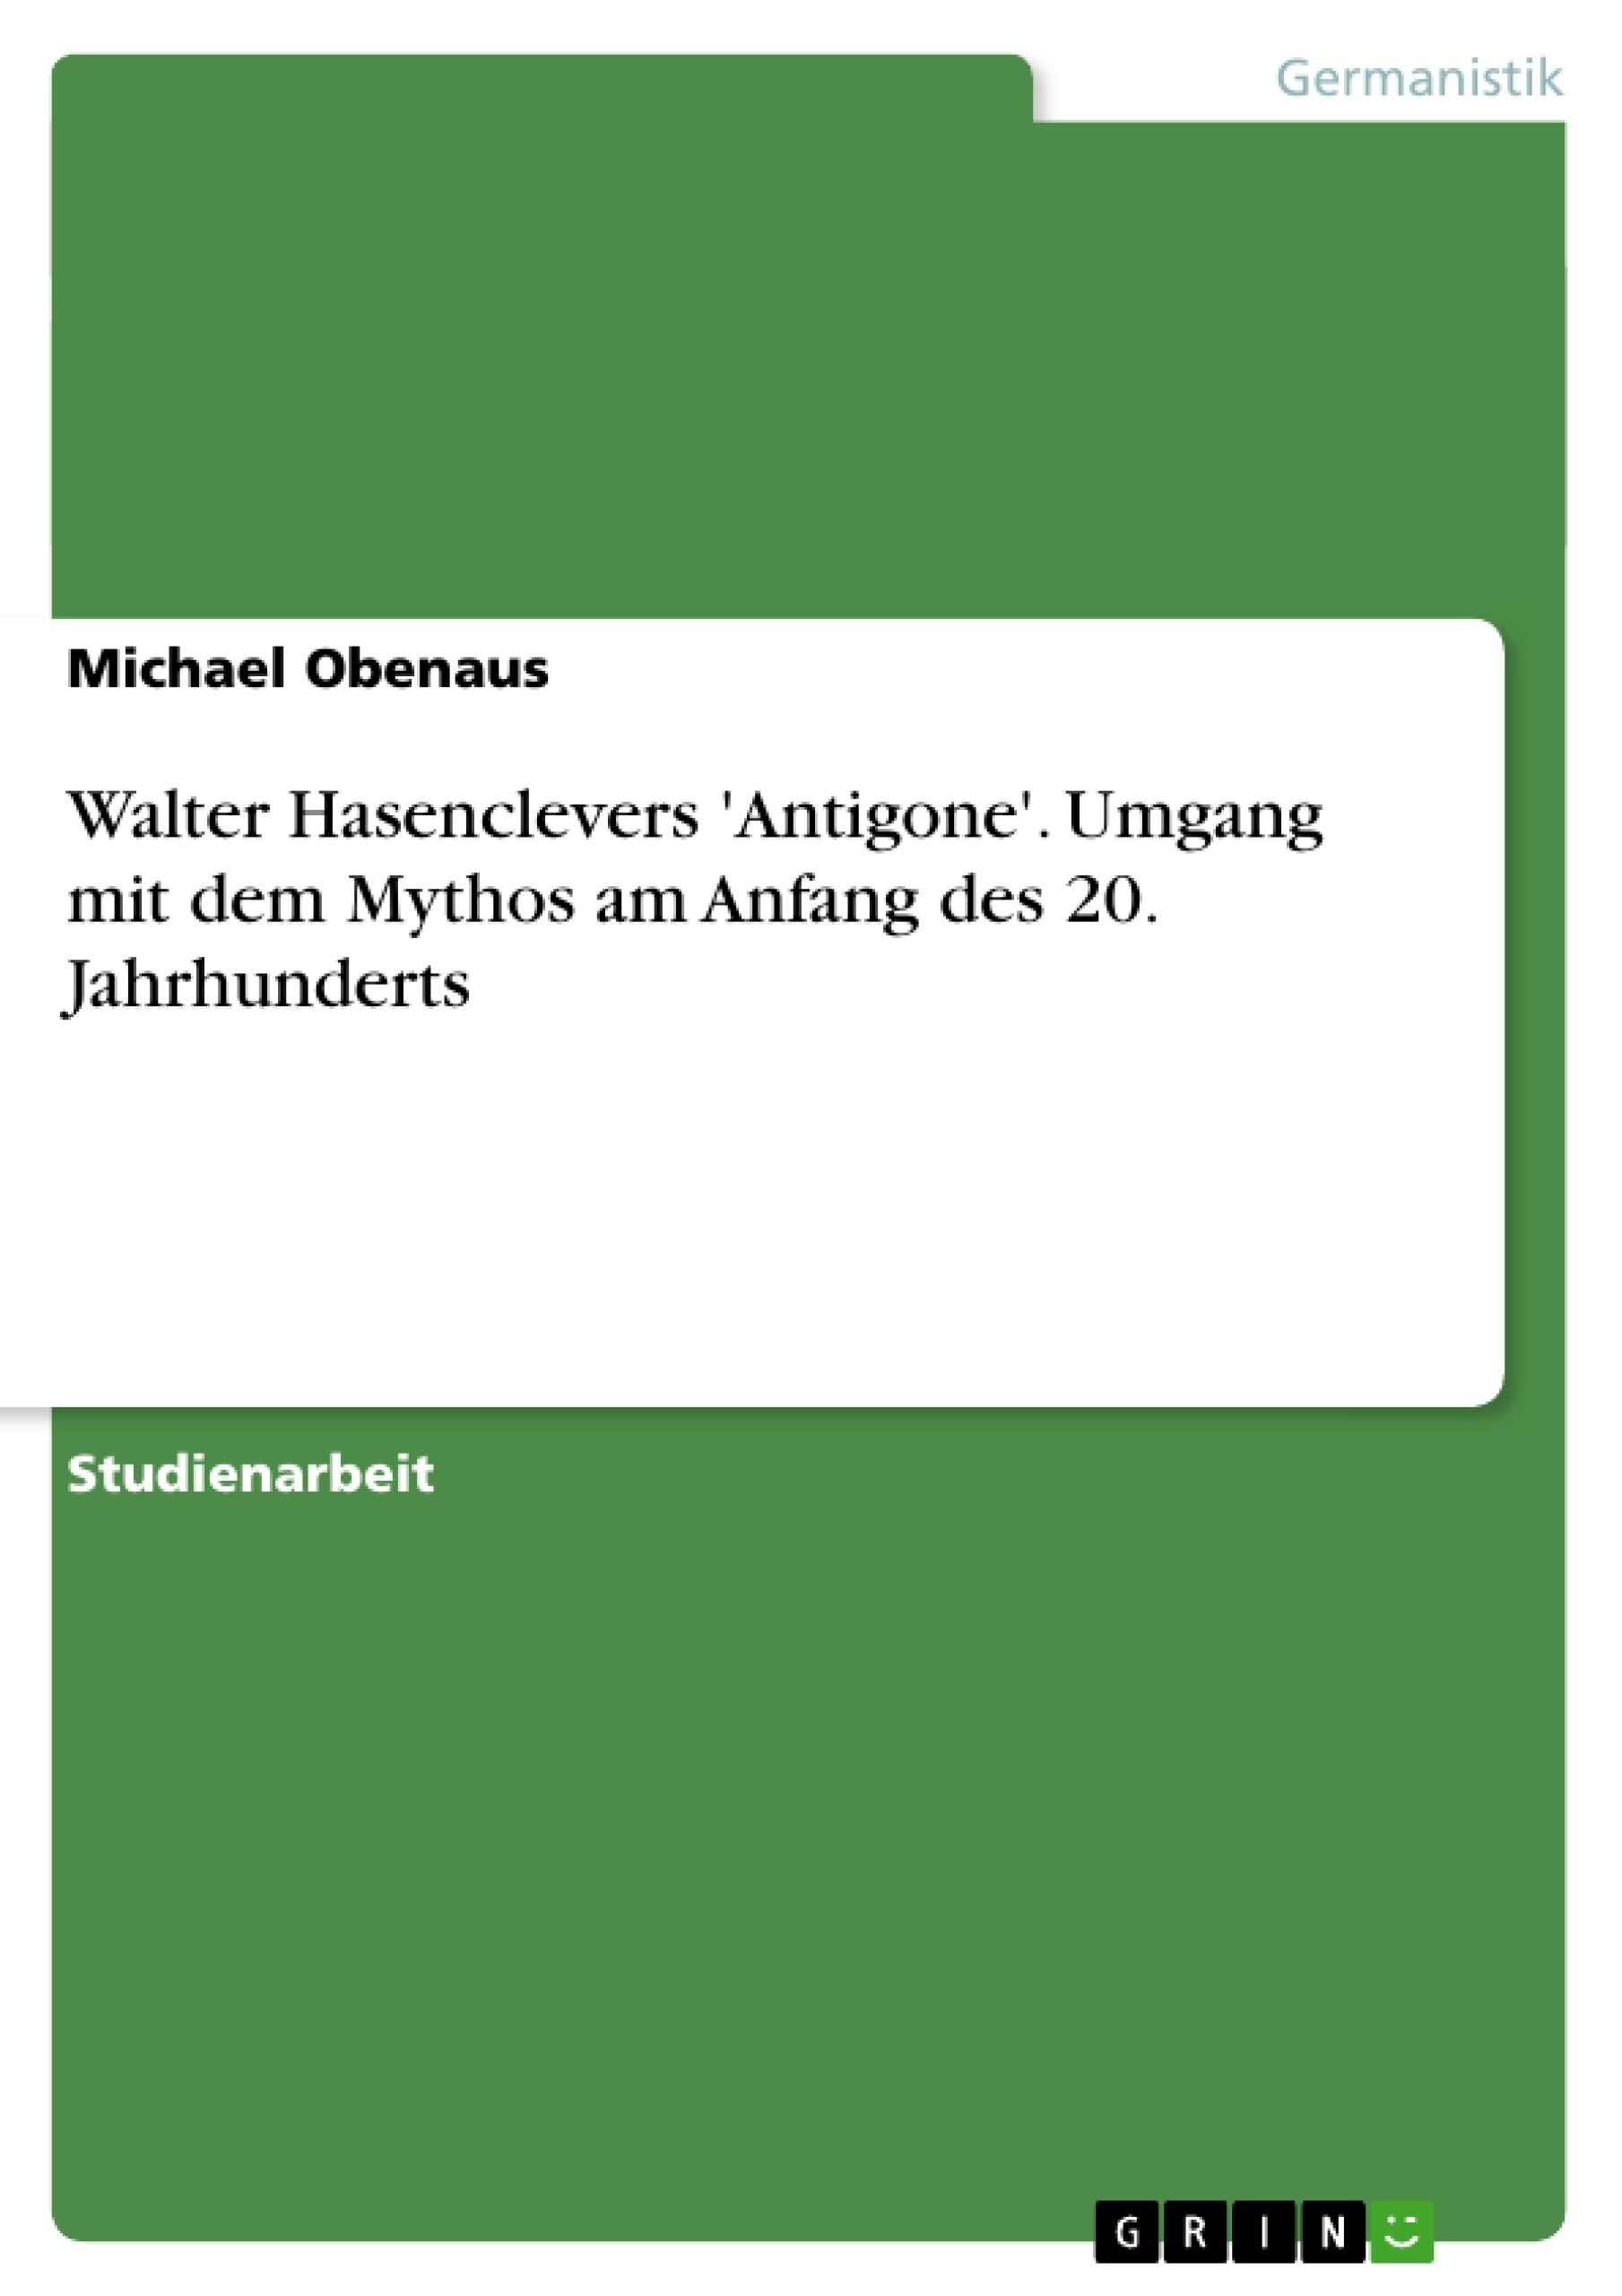 Titel: Walter Hasenclevers 'Antigone'. Umgang mit dem Mythos am Anfang des 20. Jahrhunderts